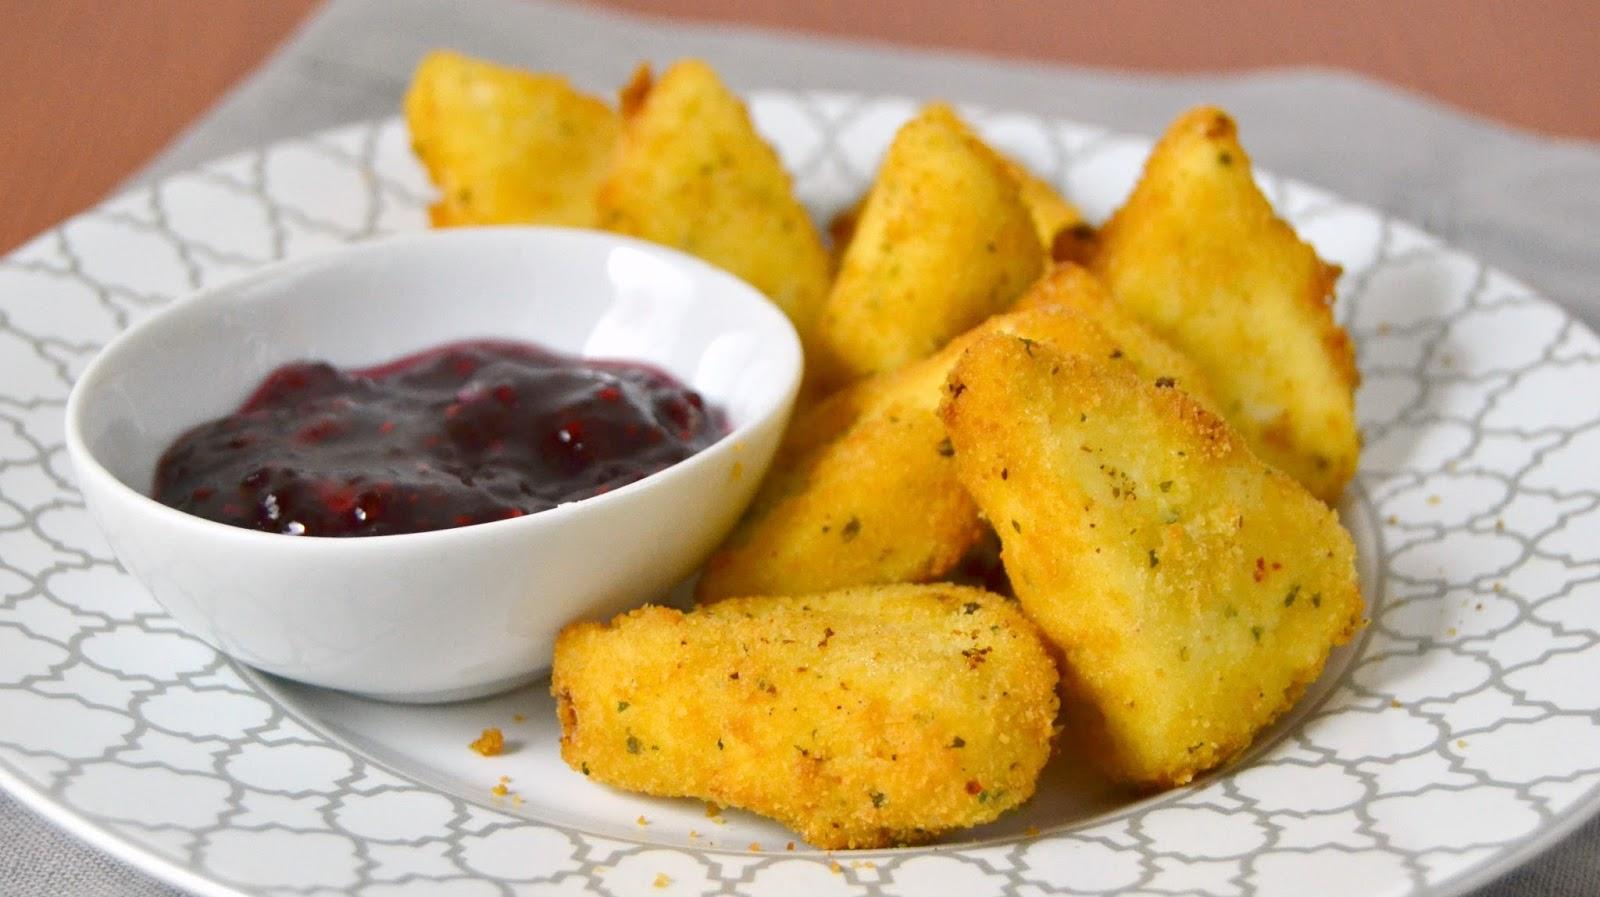 Quesitos fritos con mermelada cuuking recetas de cocina - Como hacer aperitivos frios ...